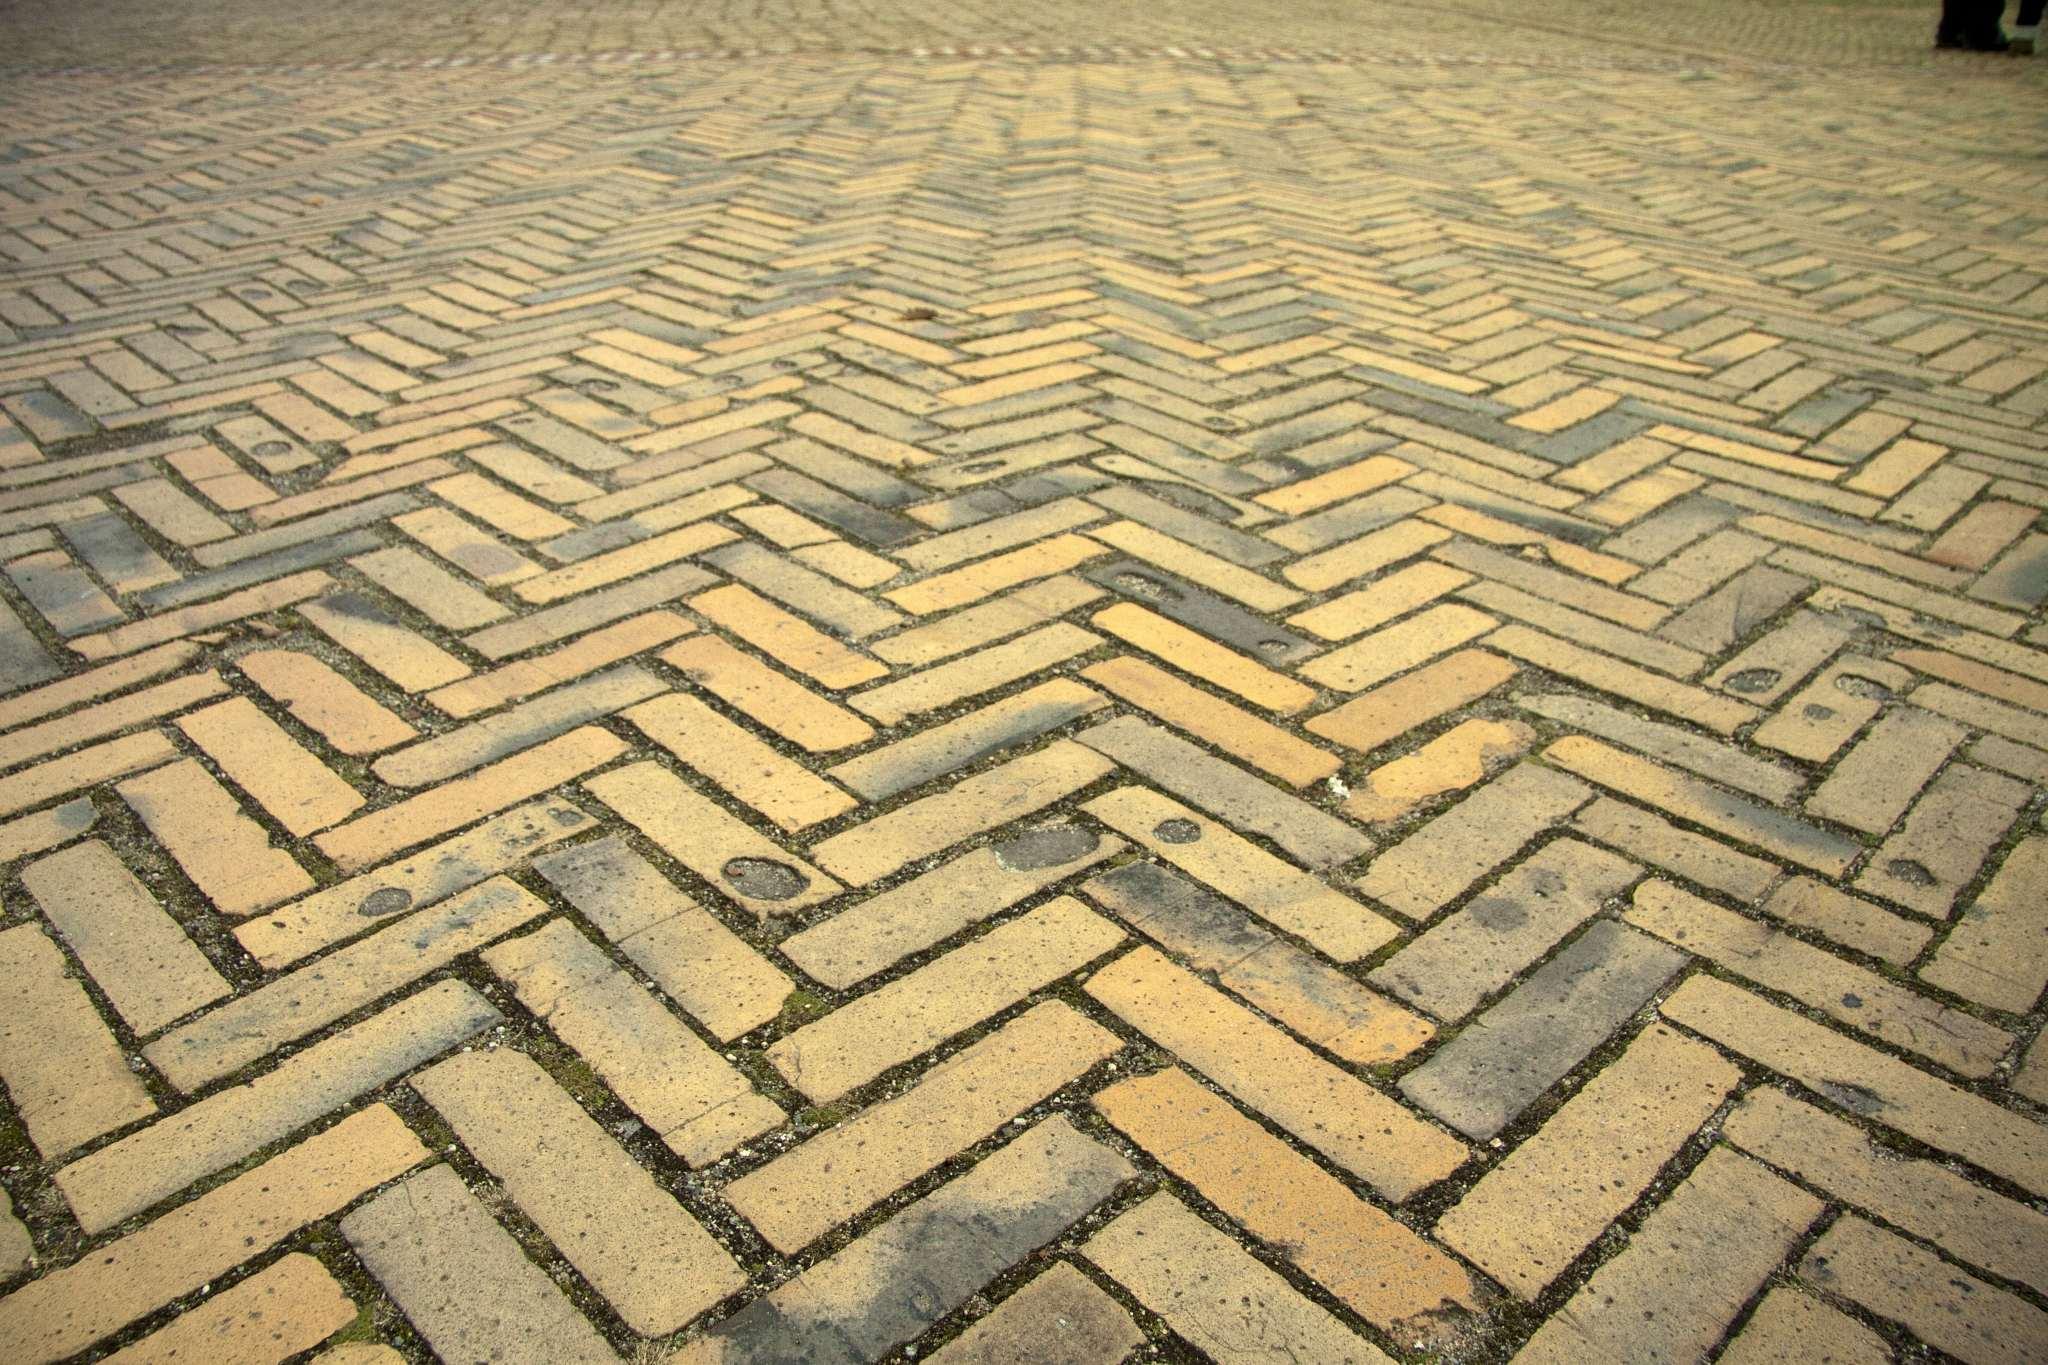 tesselation underfoot